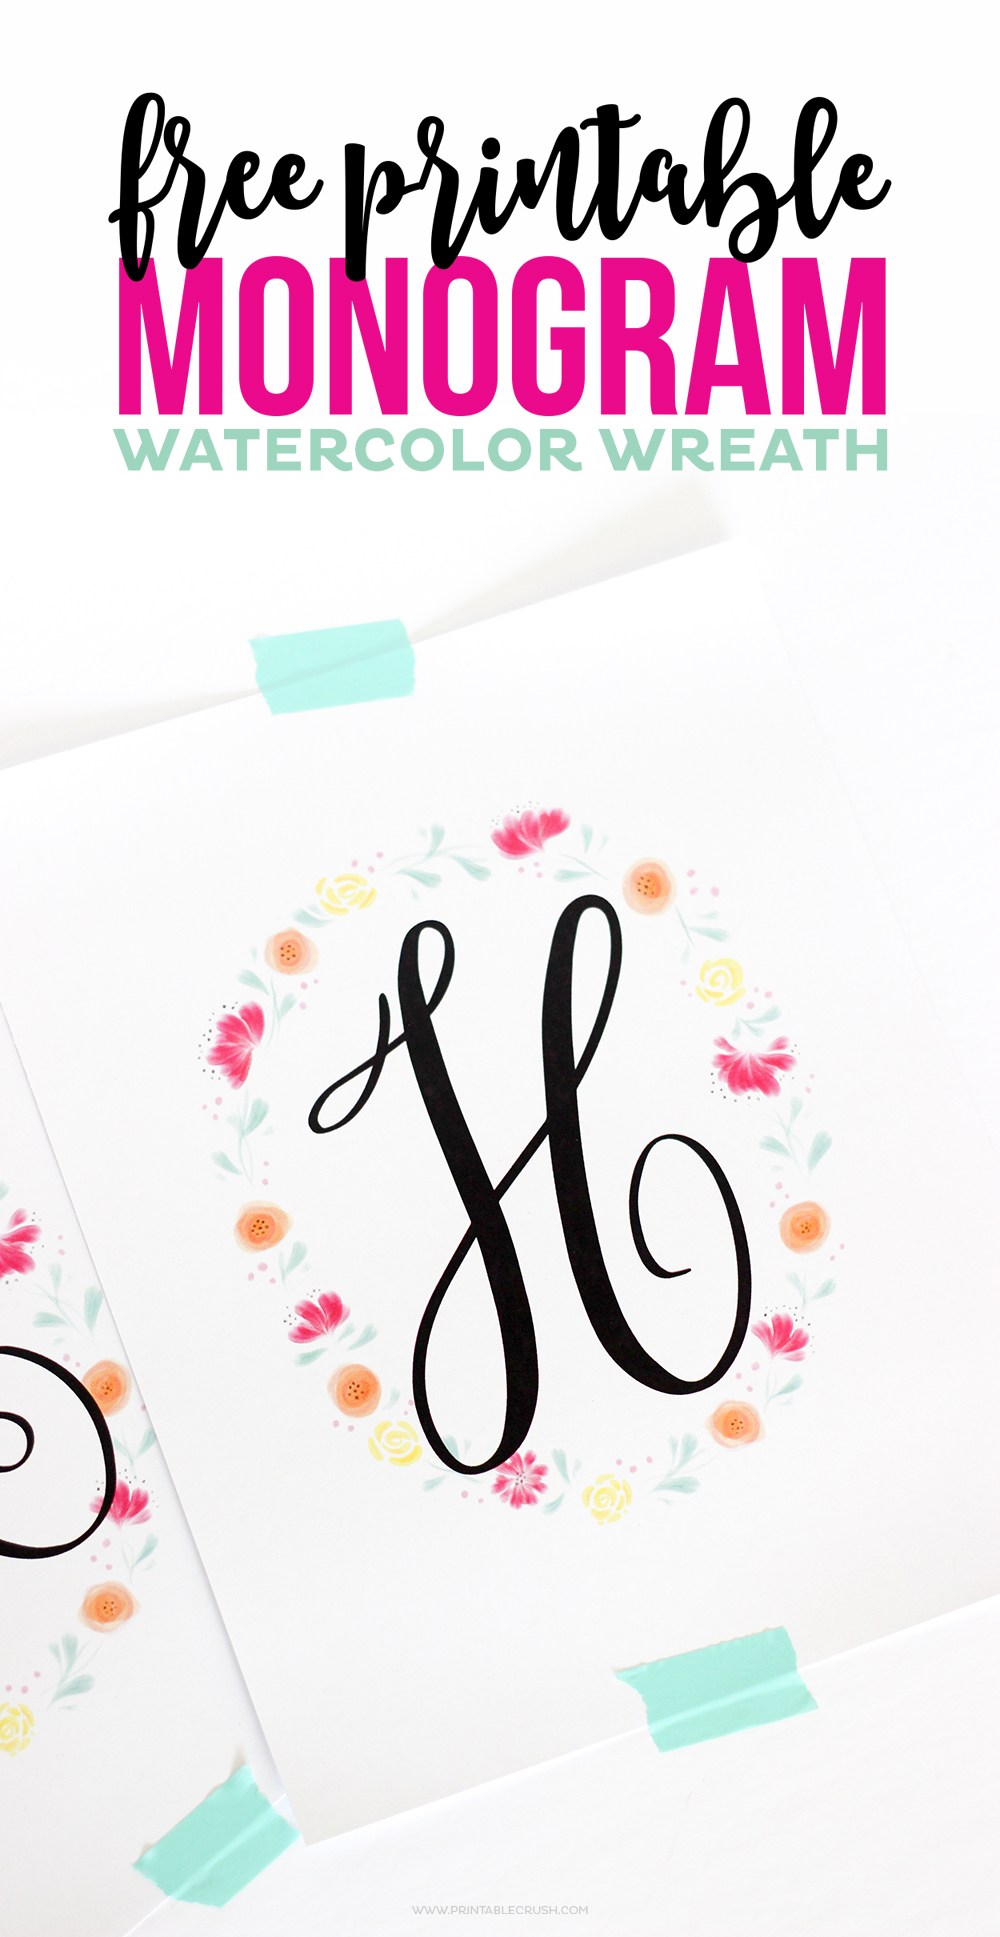 image regarding Free Printable Monogram referred to as No cost Printable Watercolor Monogram Wreaths - Printable Crush